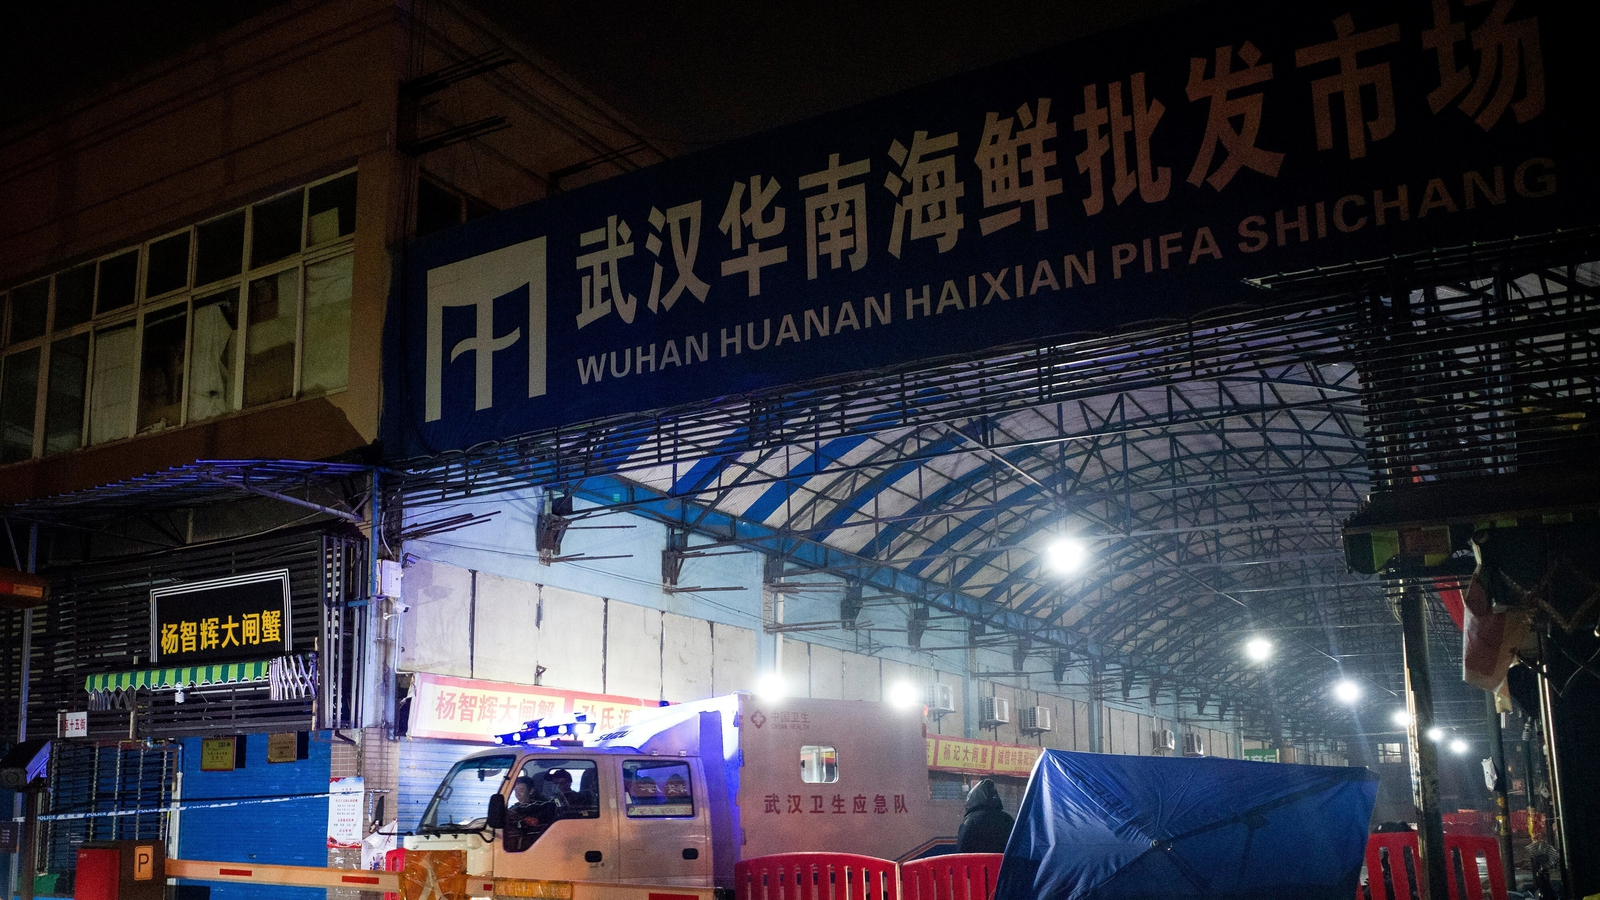 Image - A shut-down Huanan Seafood Wholesale Market on 11 January